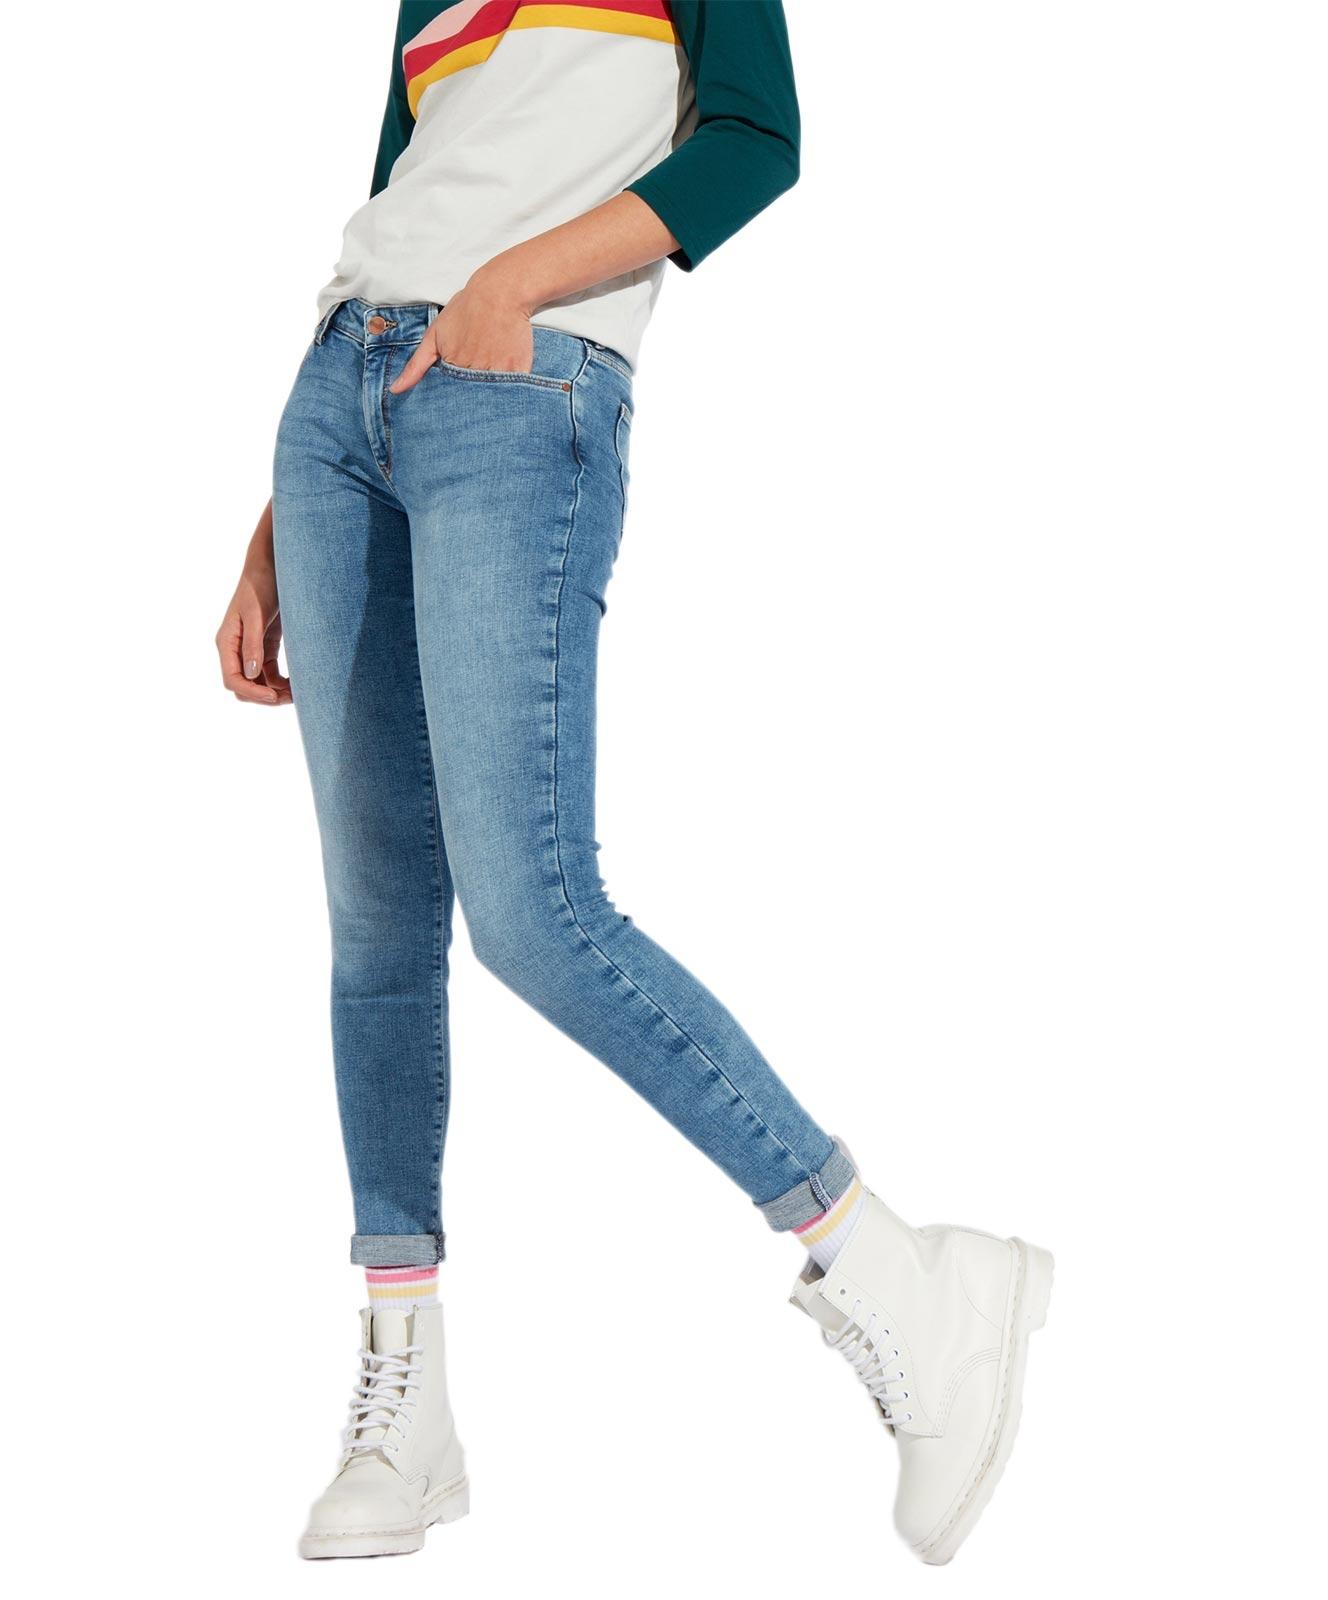 Hosen für Frauen - Wrangler Damen Skinny Jeans in Wasserblau  - Onlineshop Jeans Meile